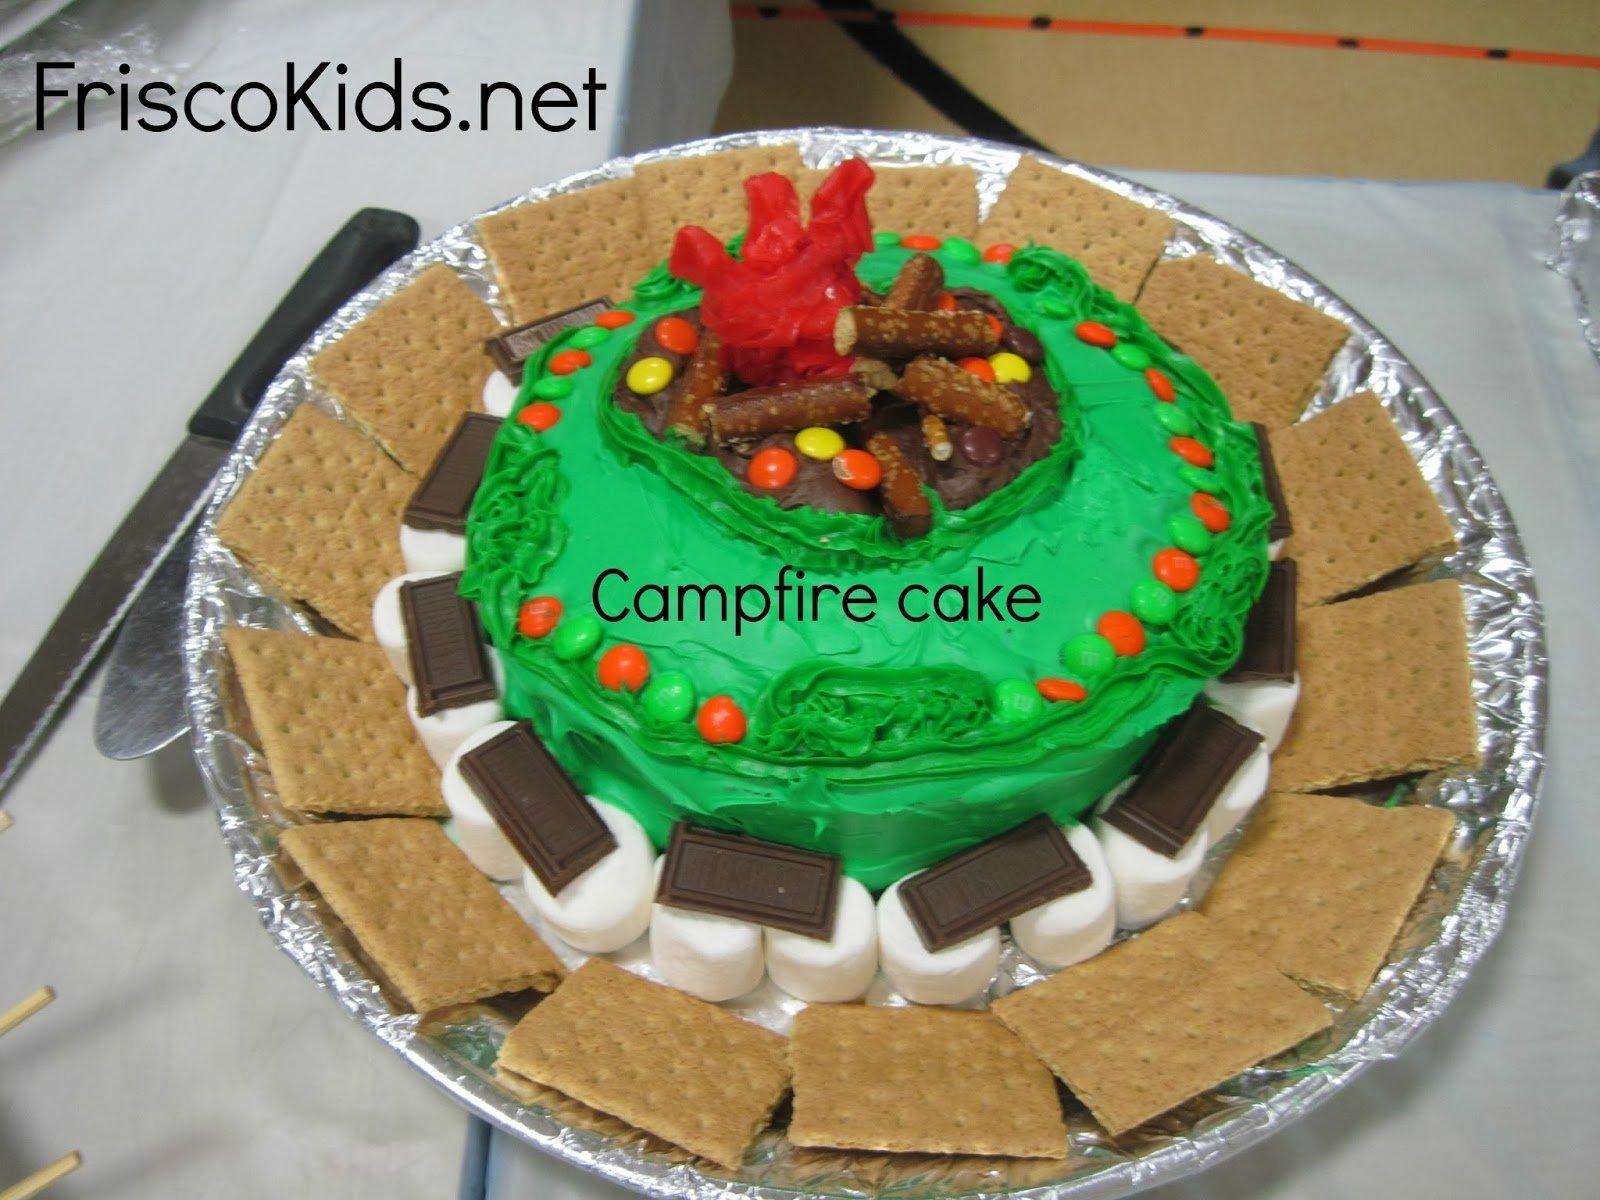 frisco kids: cub scout bake-off cake ideas - campfire cake - http